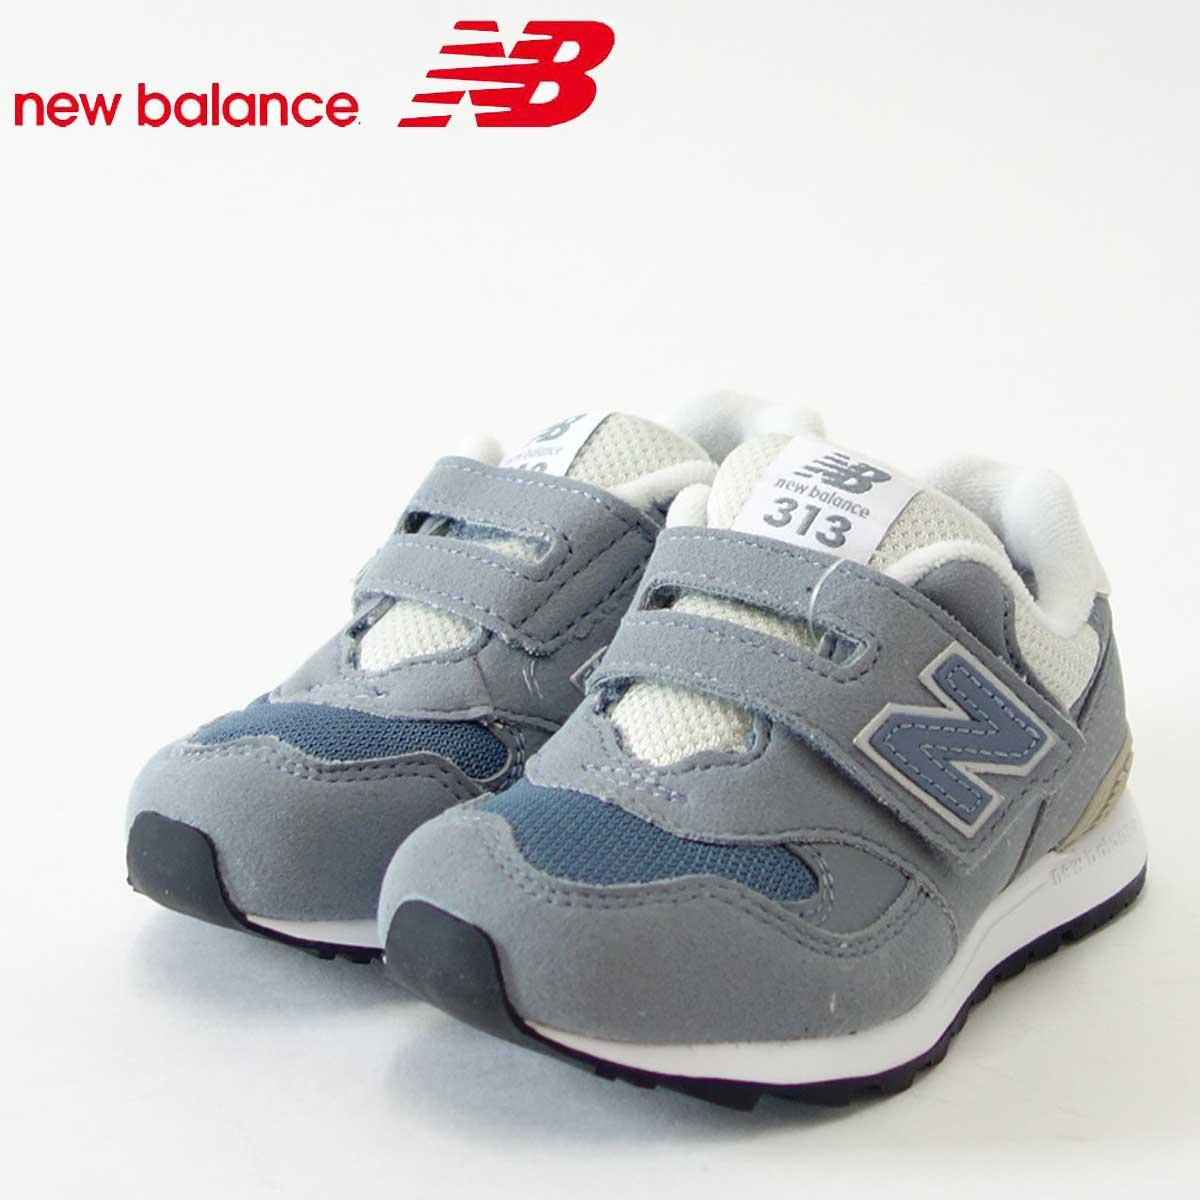 new balance 372